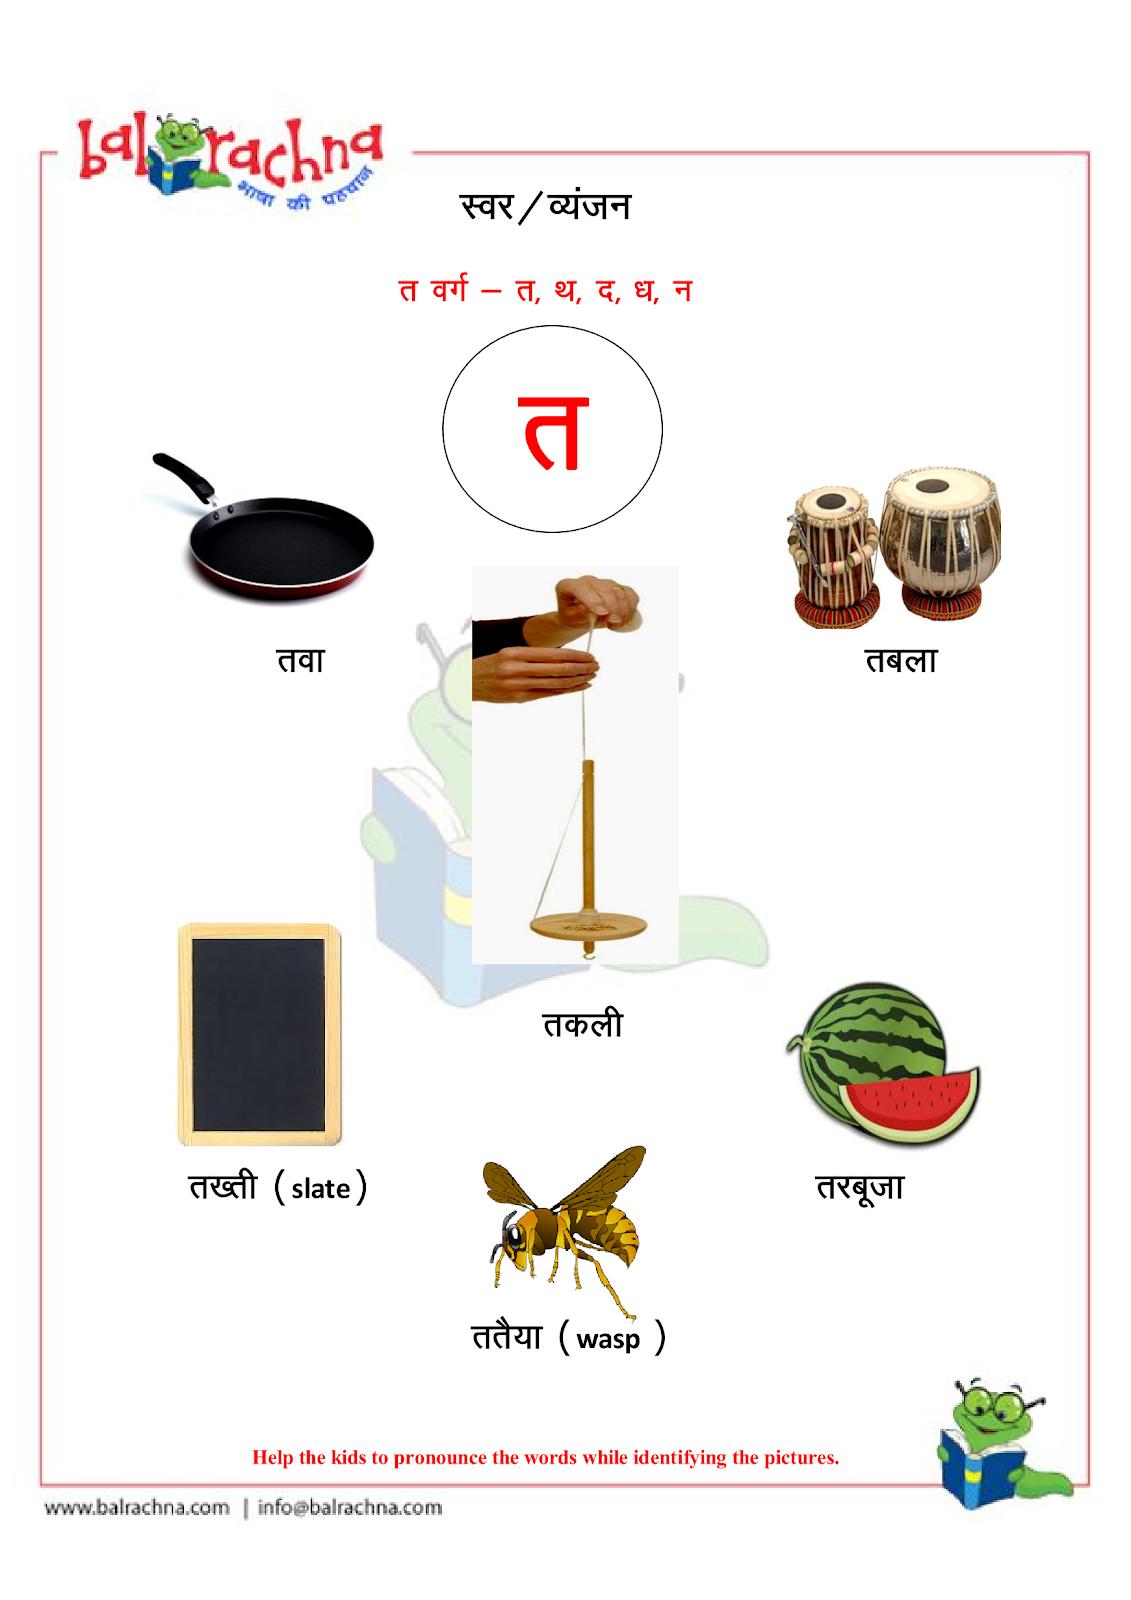 Balrachna Preparatory School Varnamala Swar Vyanjan 2 Vyanjan Hindi Poems For Kids Hindi Worksheets Hindi Language Learning [ 1600 x 1131 Pixel ]